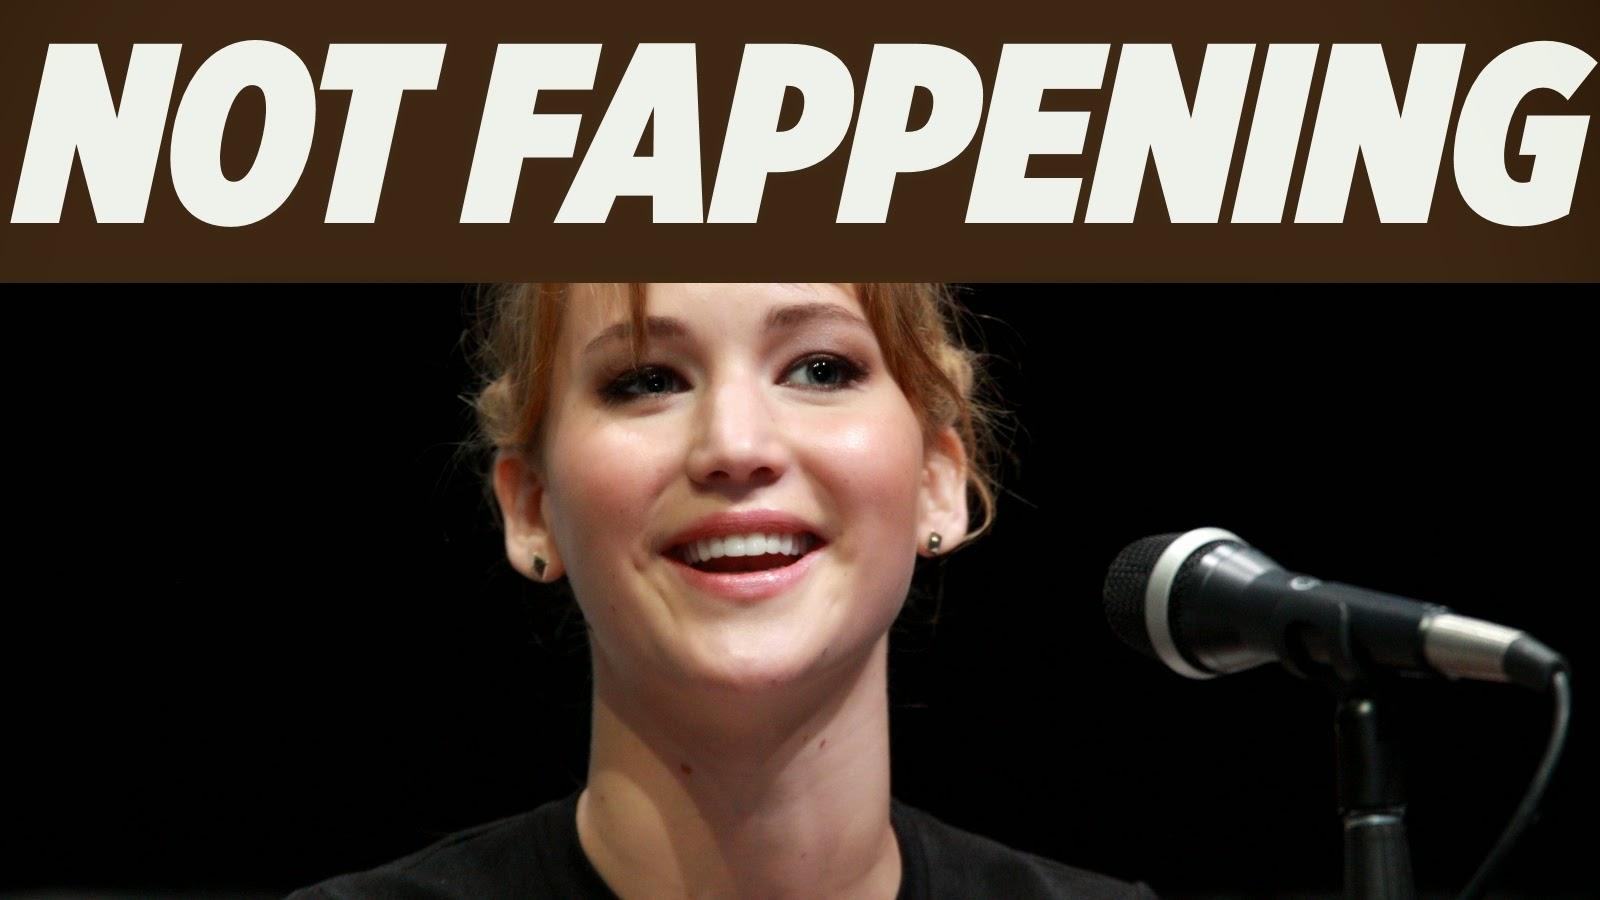 fappening4.com